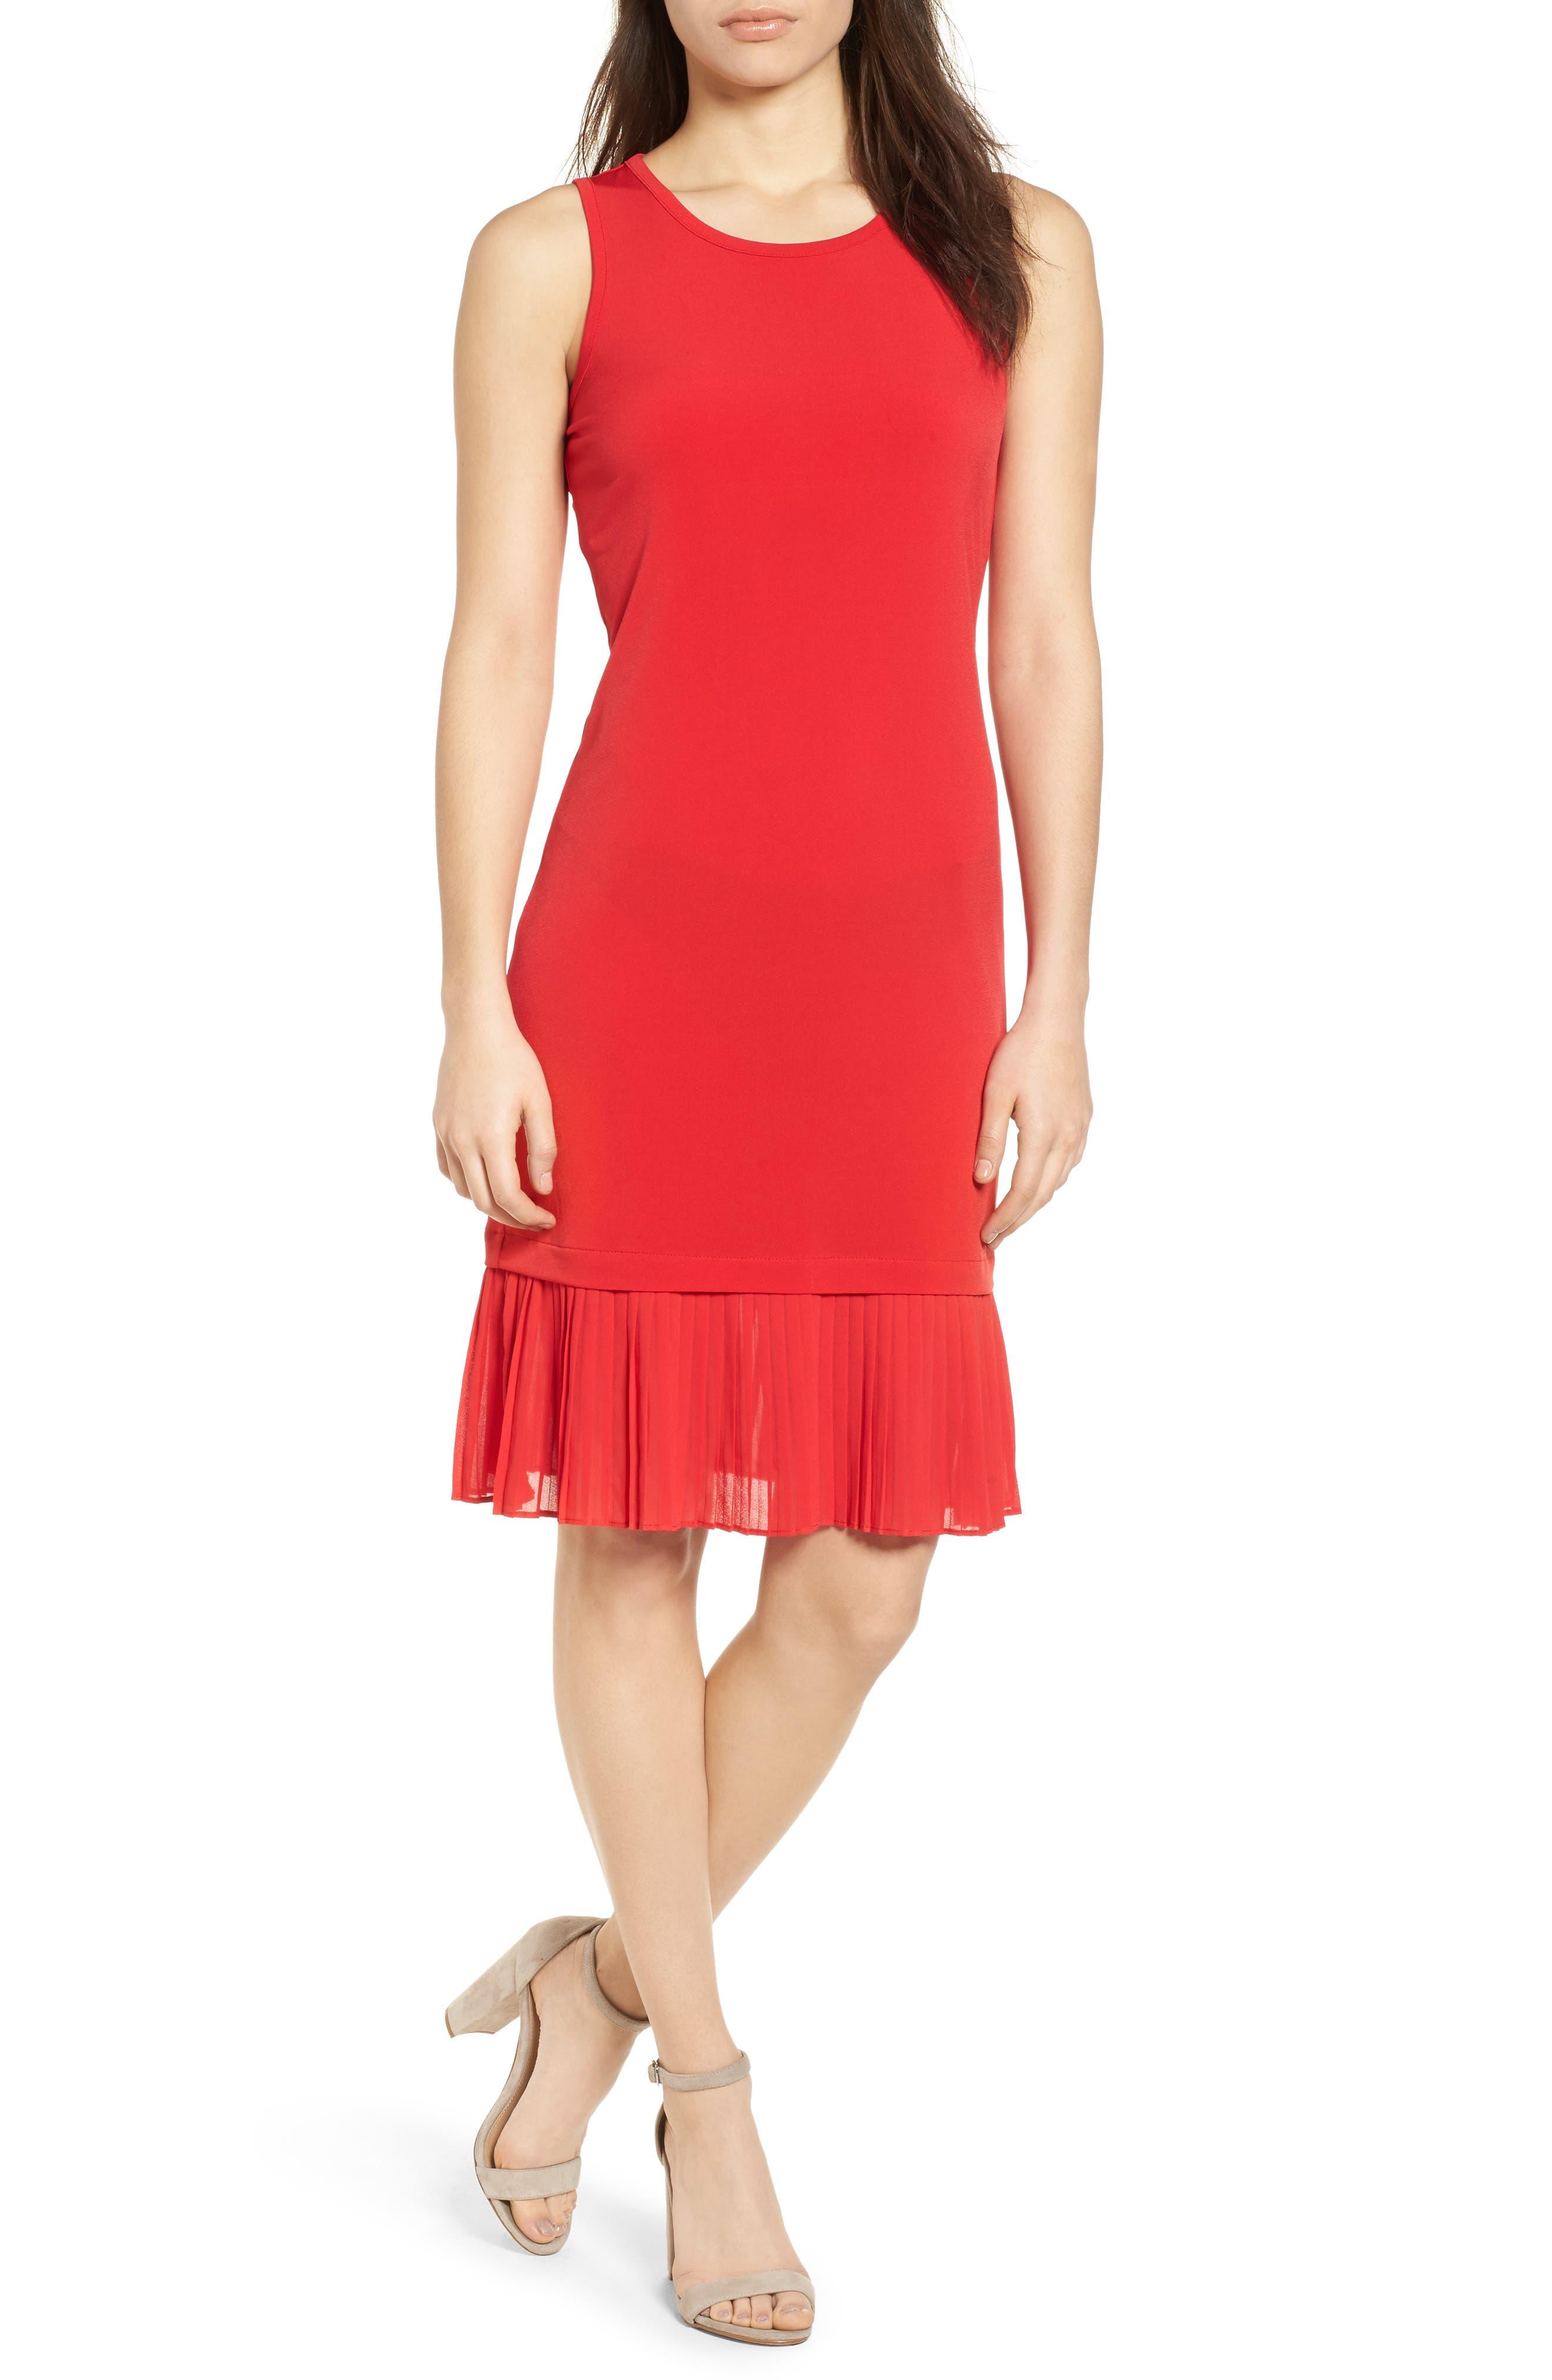 Cheap red tank dress